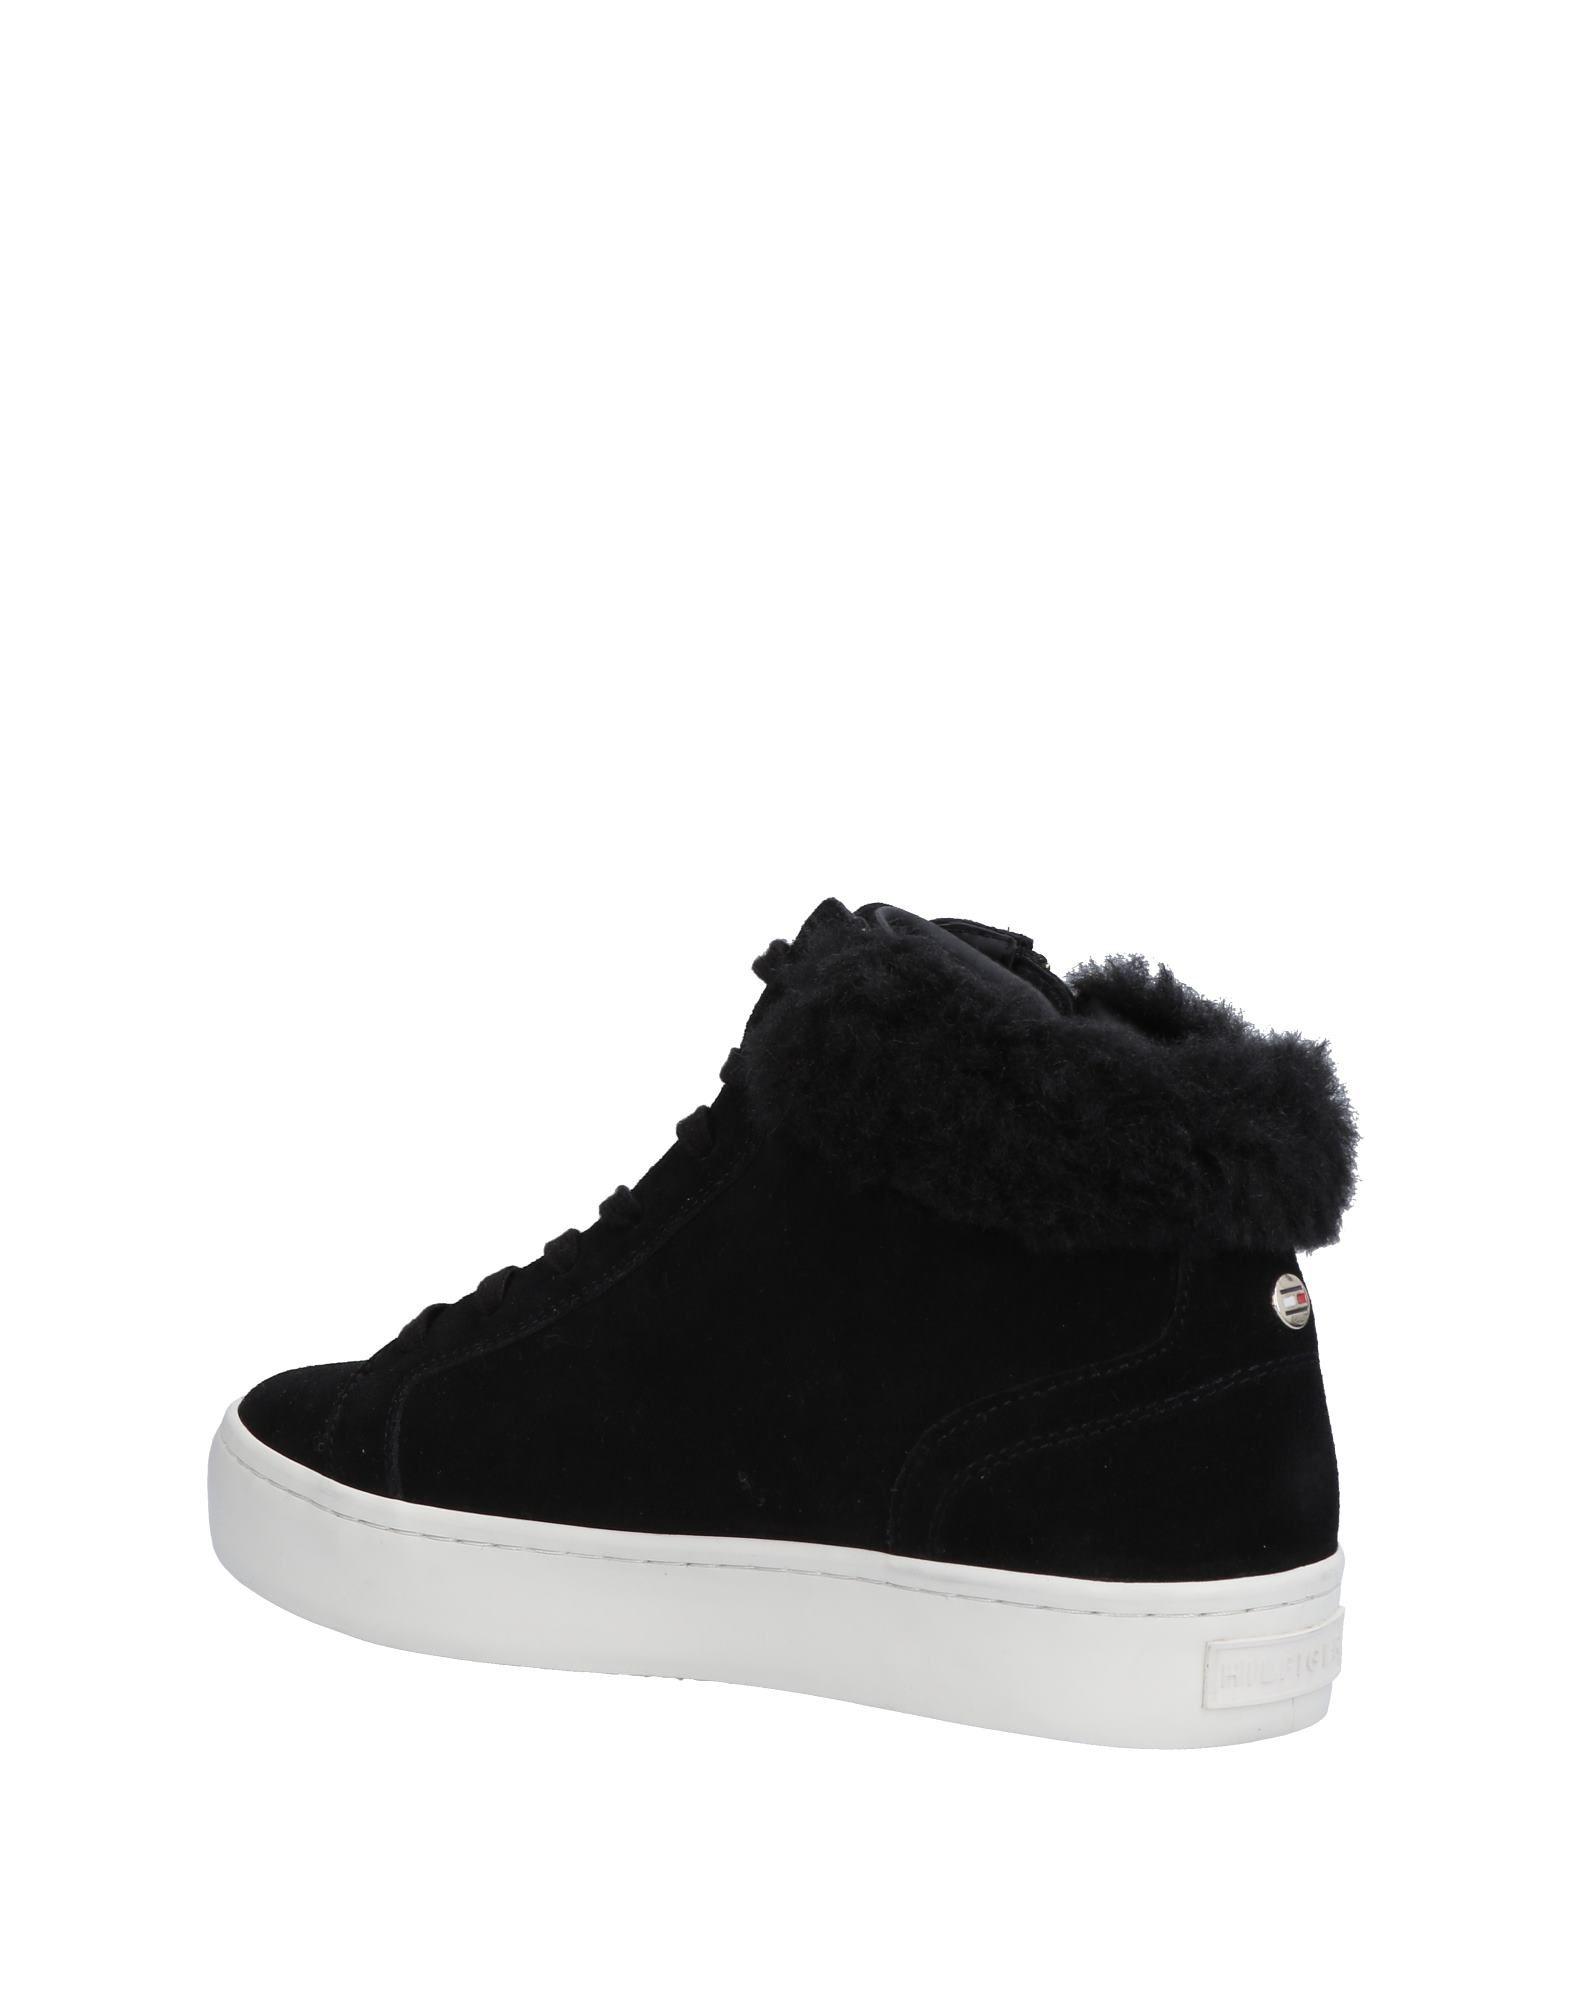 Tommy 11495697AT Hilfiger Sneakers Damen  11495697AT Tommy Gute Qualität beliebte Schuhe f19831